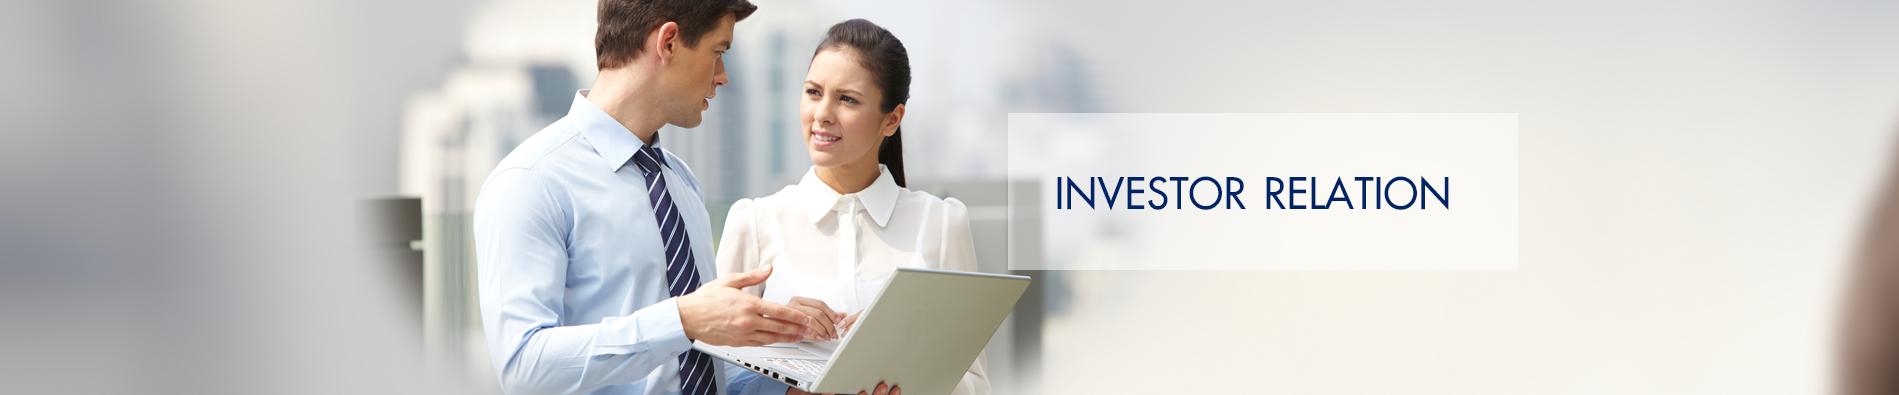 Banner Investors